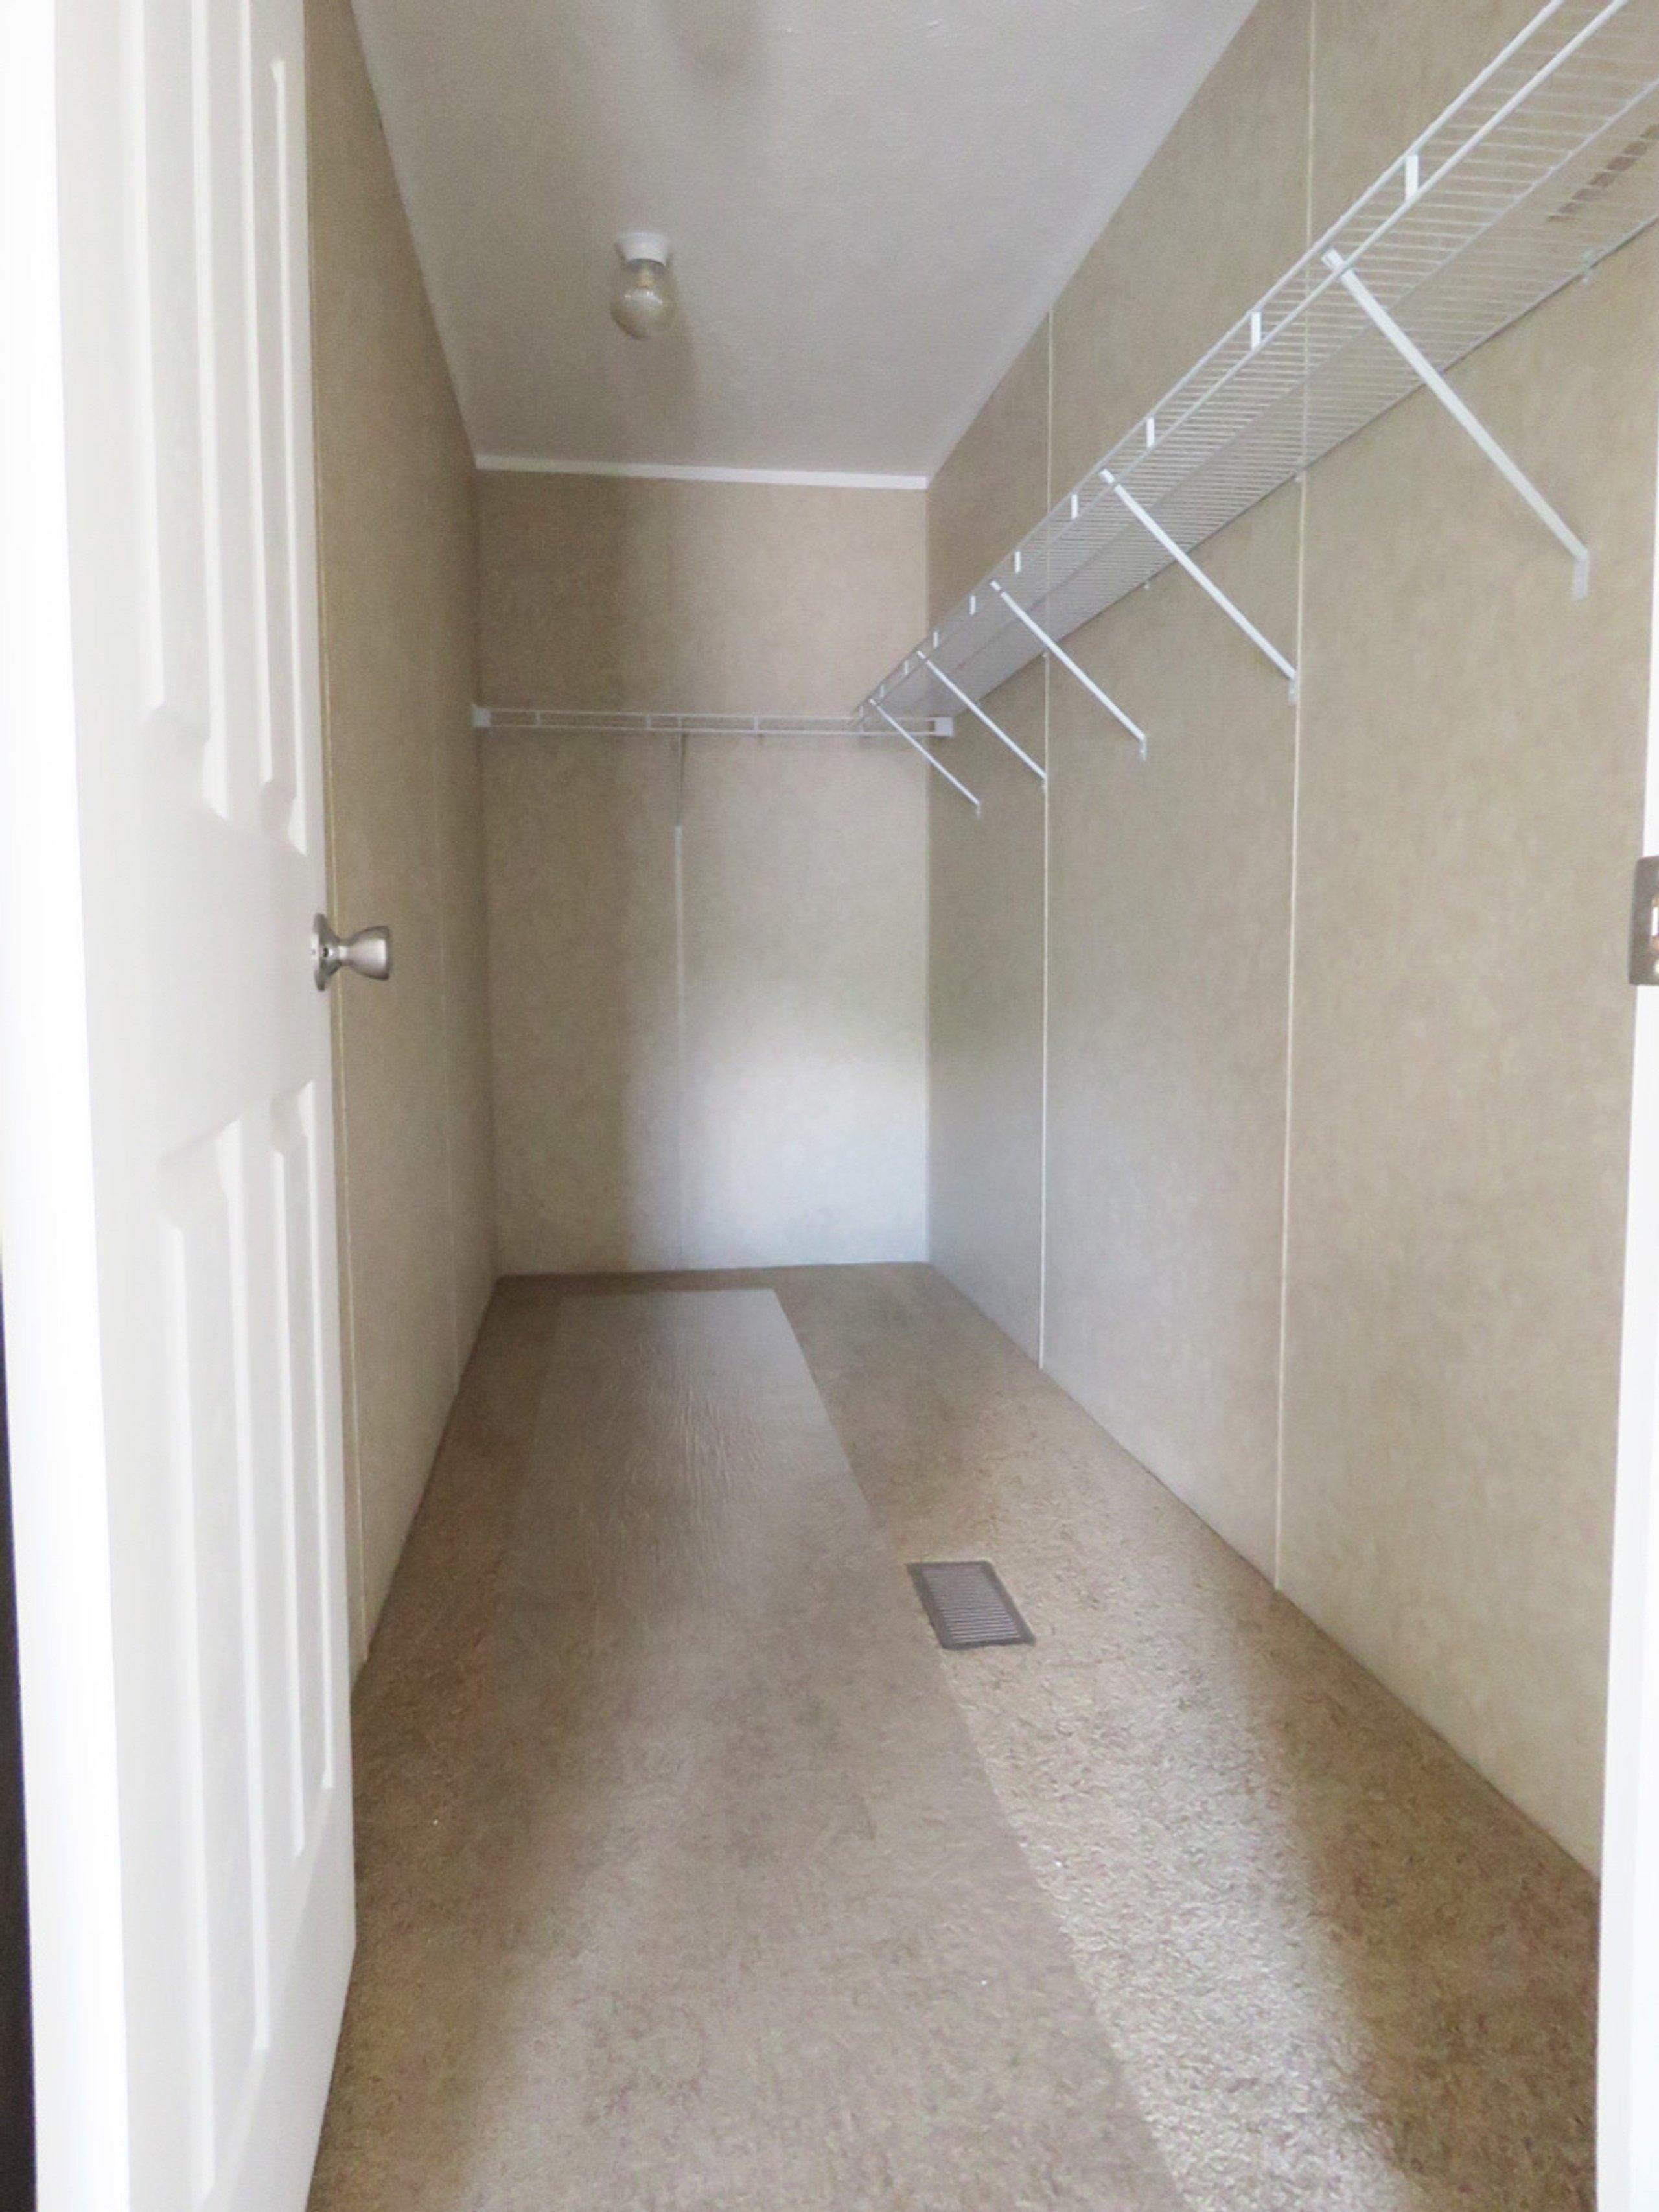 6x2 Closet self storage unit